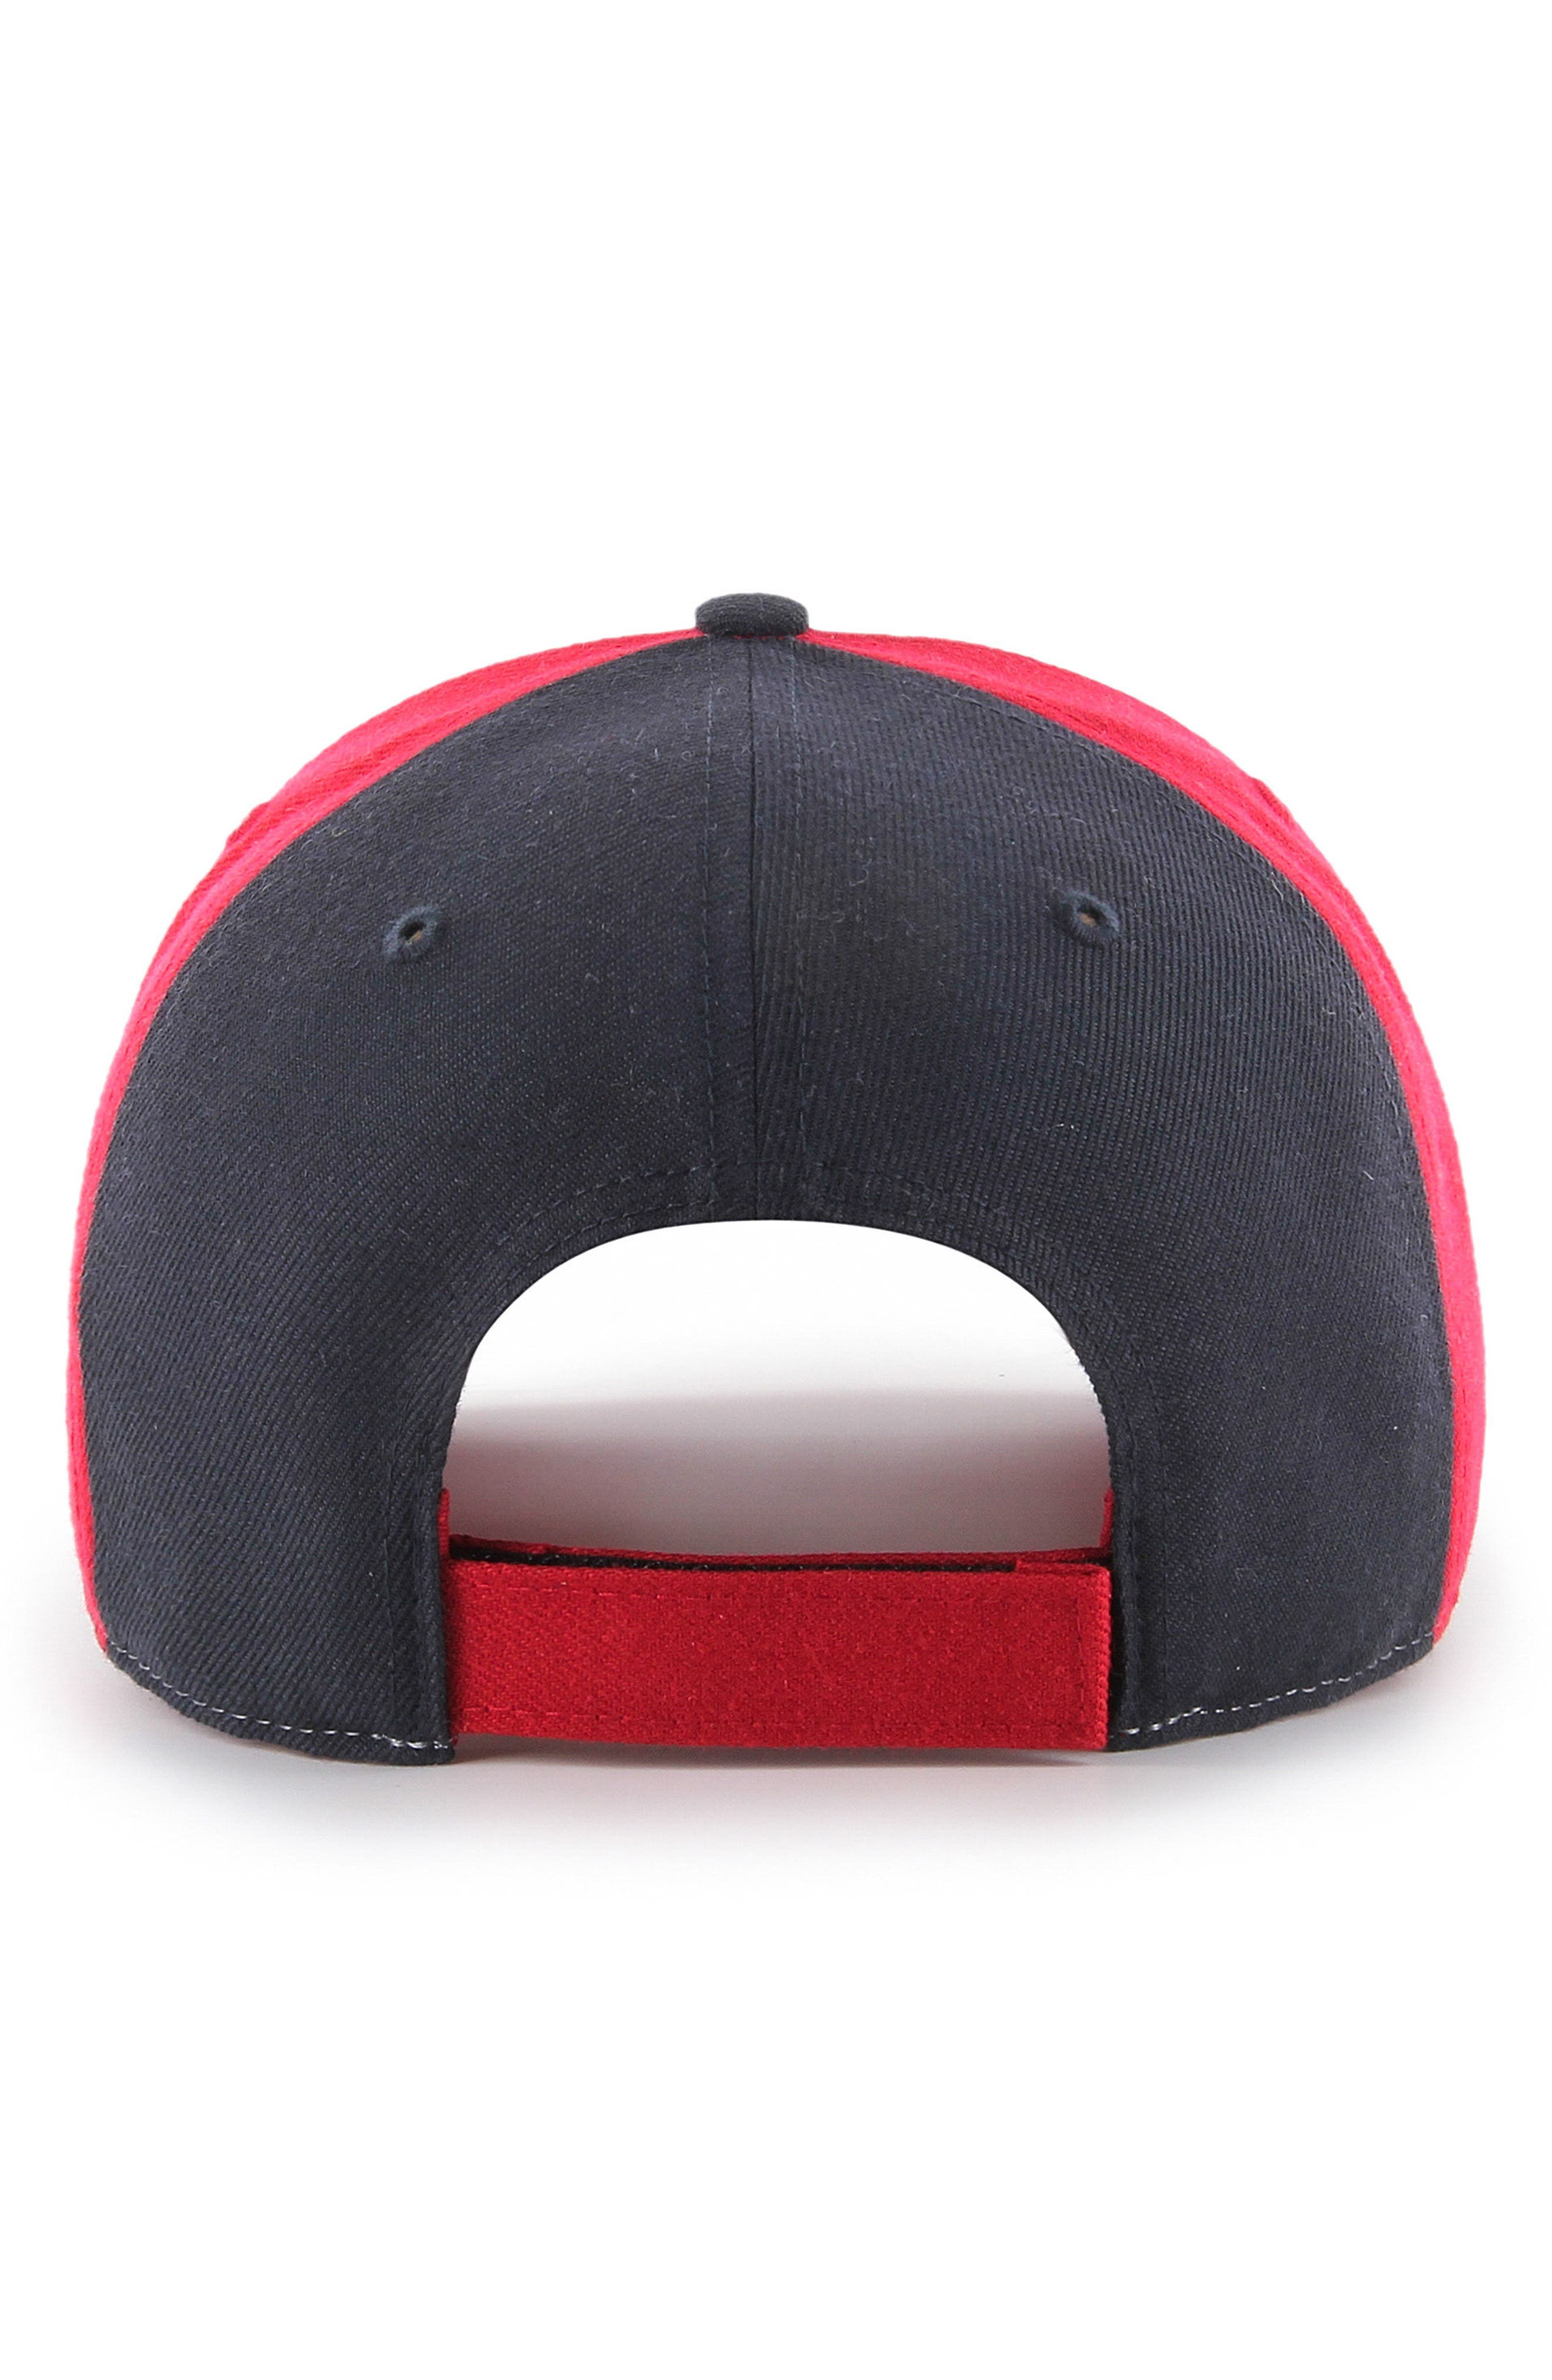 Reresto MLB Ball Cap,                             Alternate thumbnail 5, color,